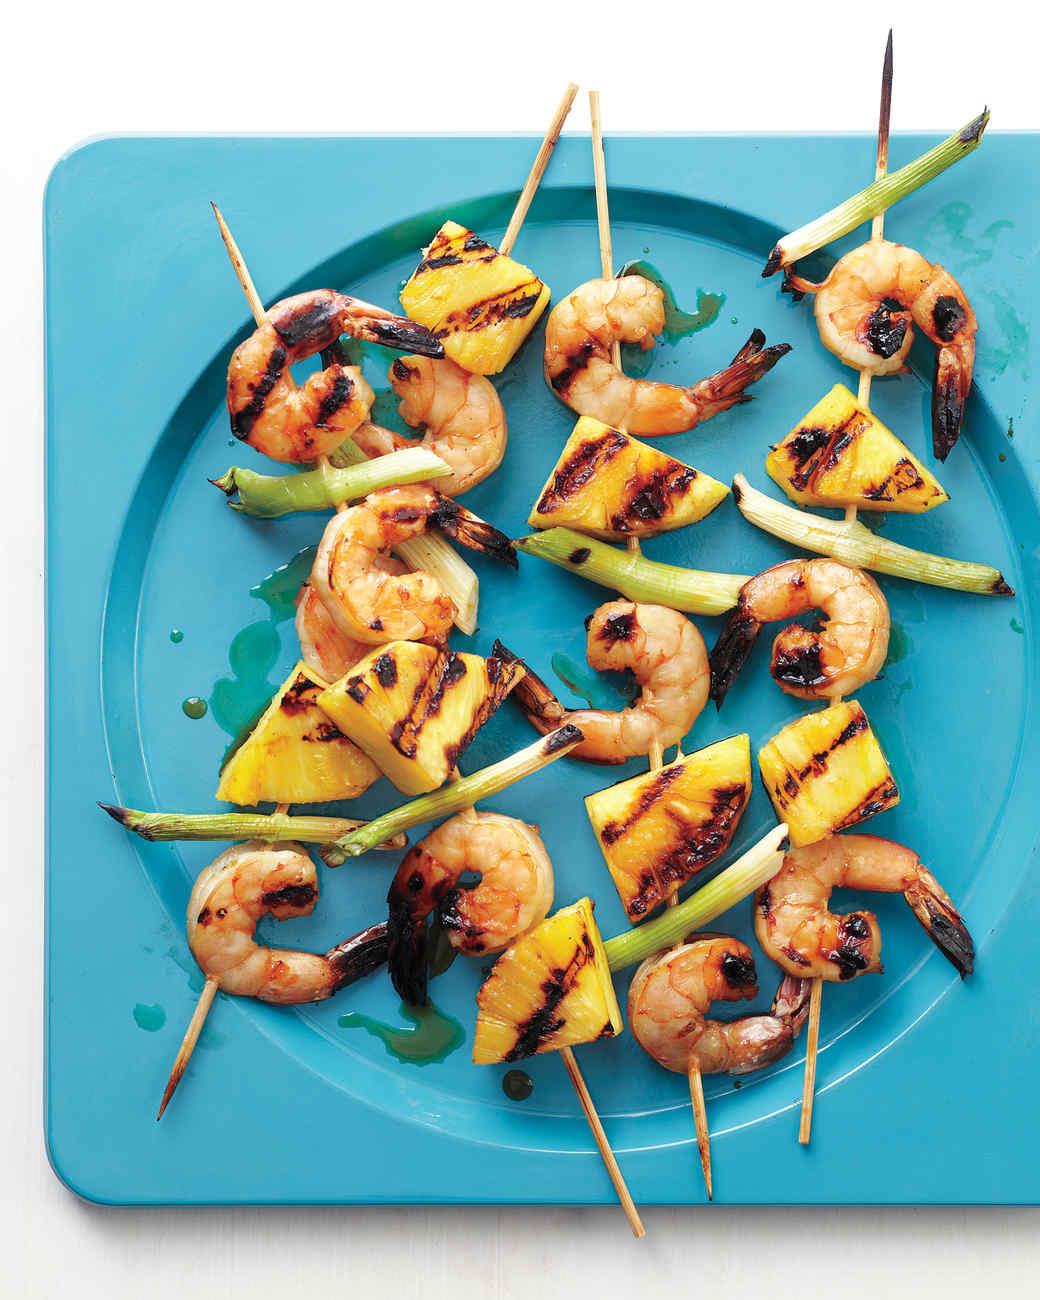 Shrimp-and-Pineapple Skewers